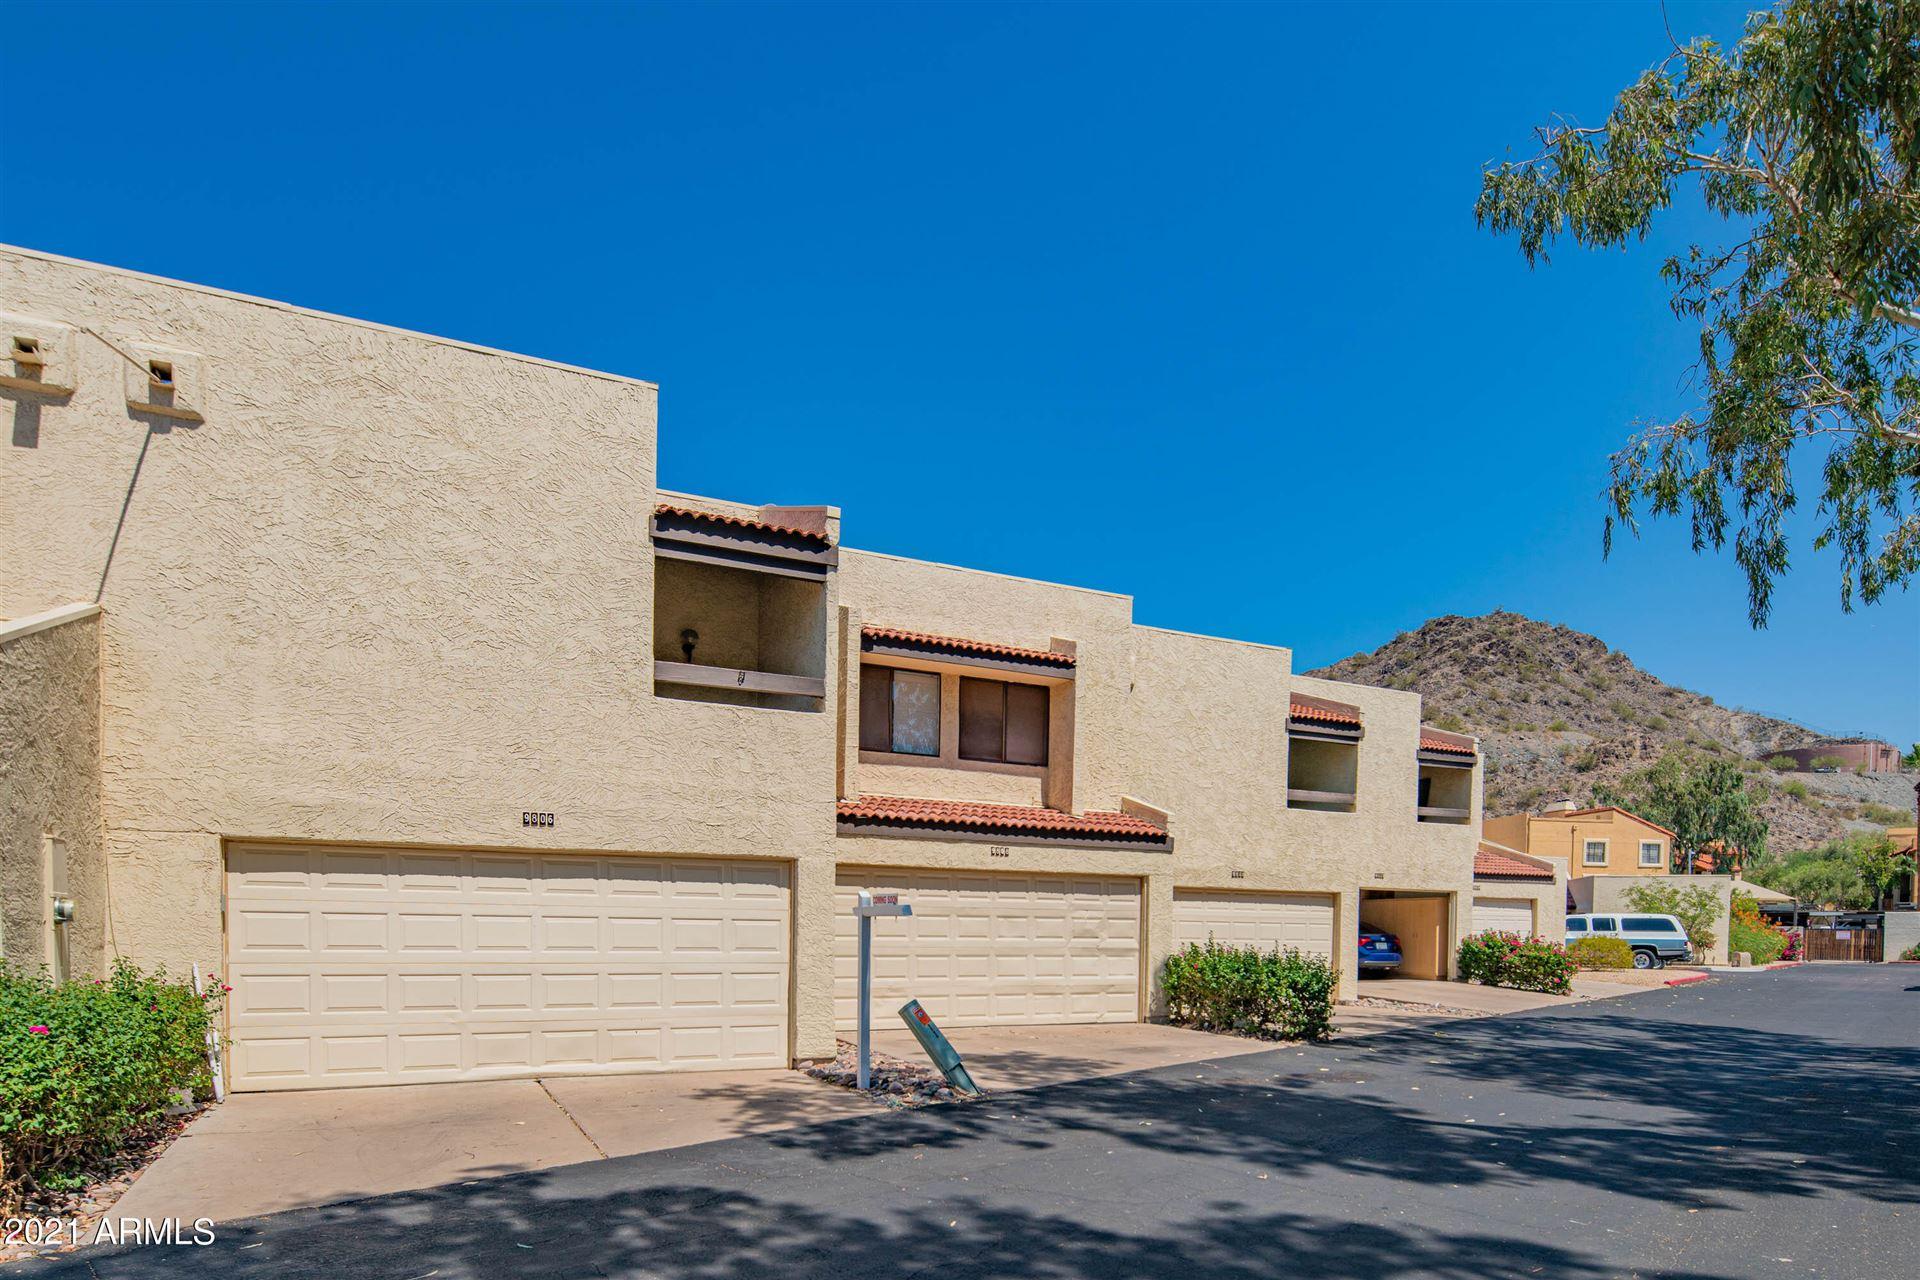 9806 N 5TH Street, Phoenix, AZ 85020 - MLS#: 6258528